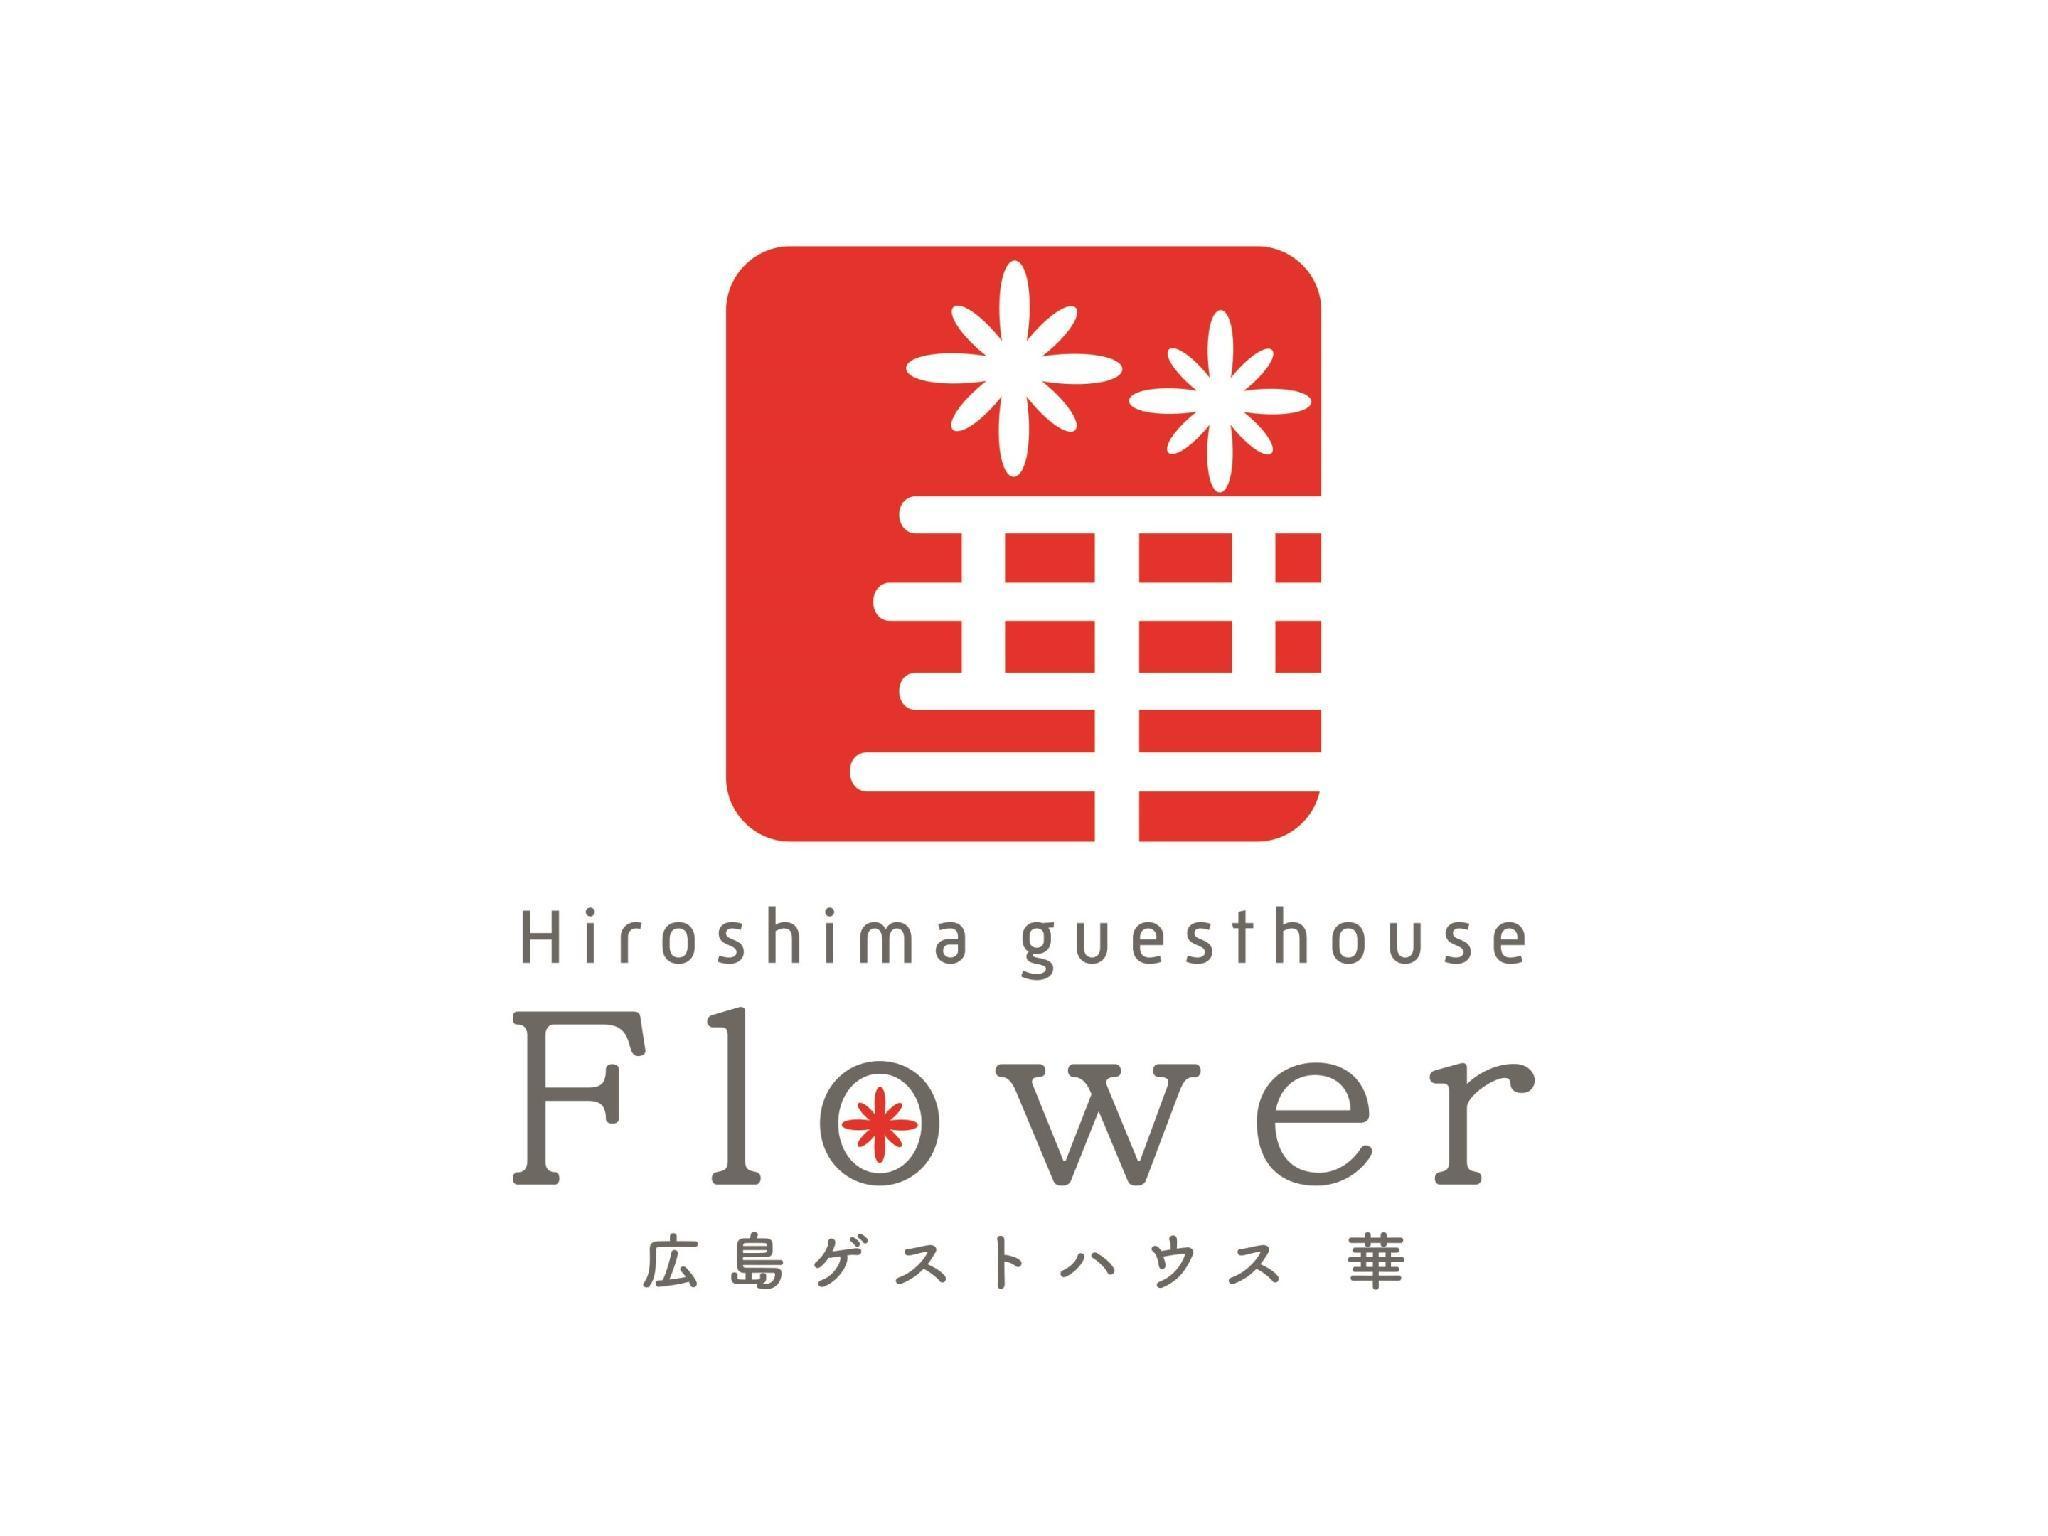 Hiroshima Guesthouse Flower